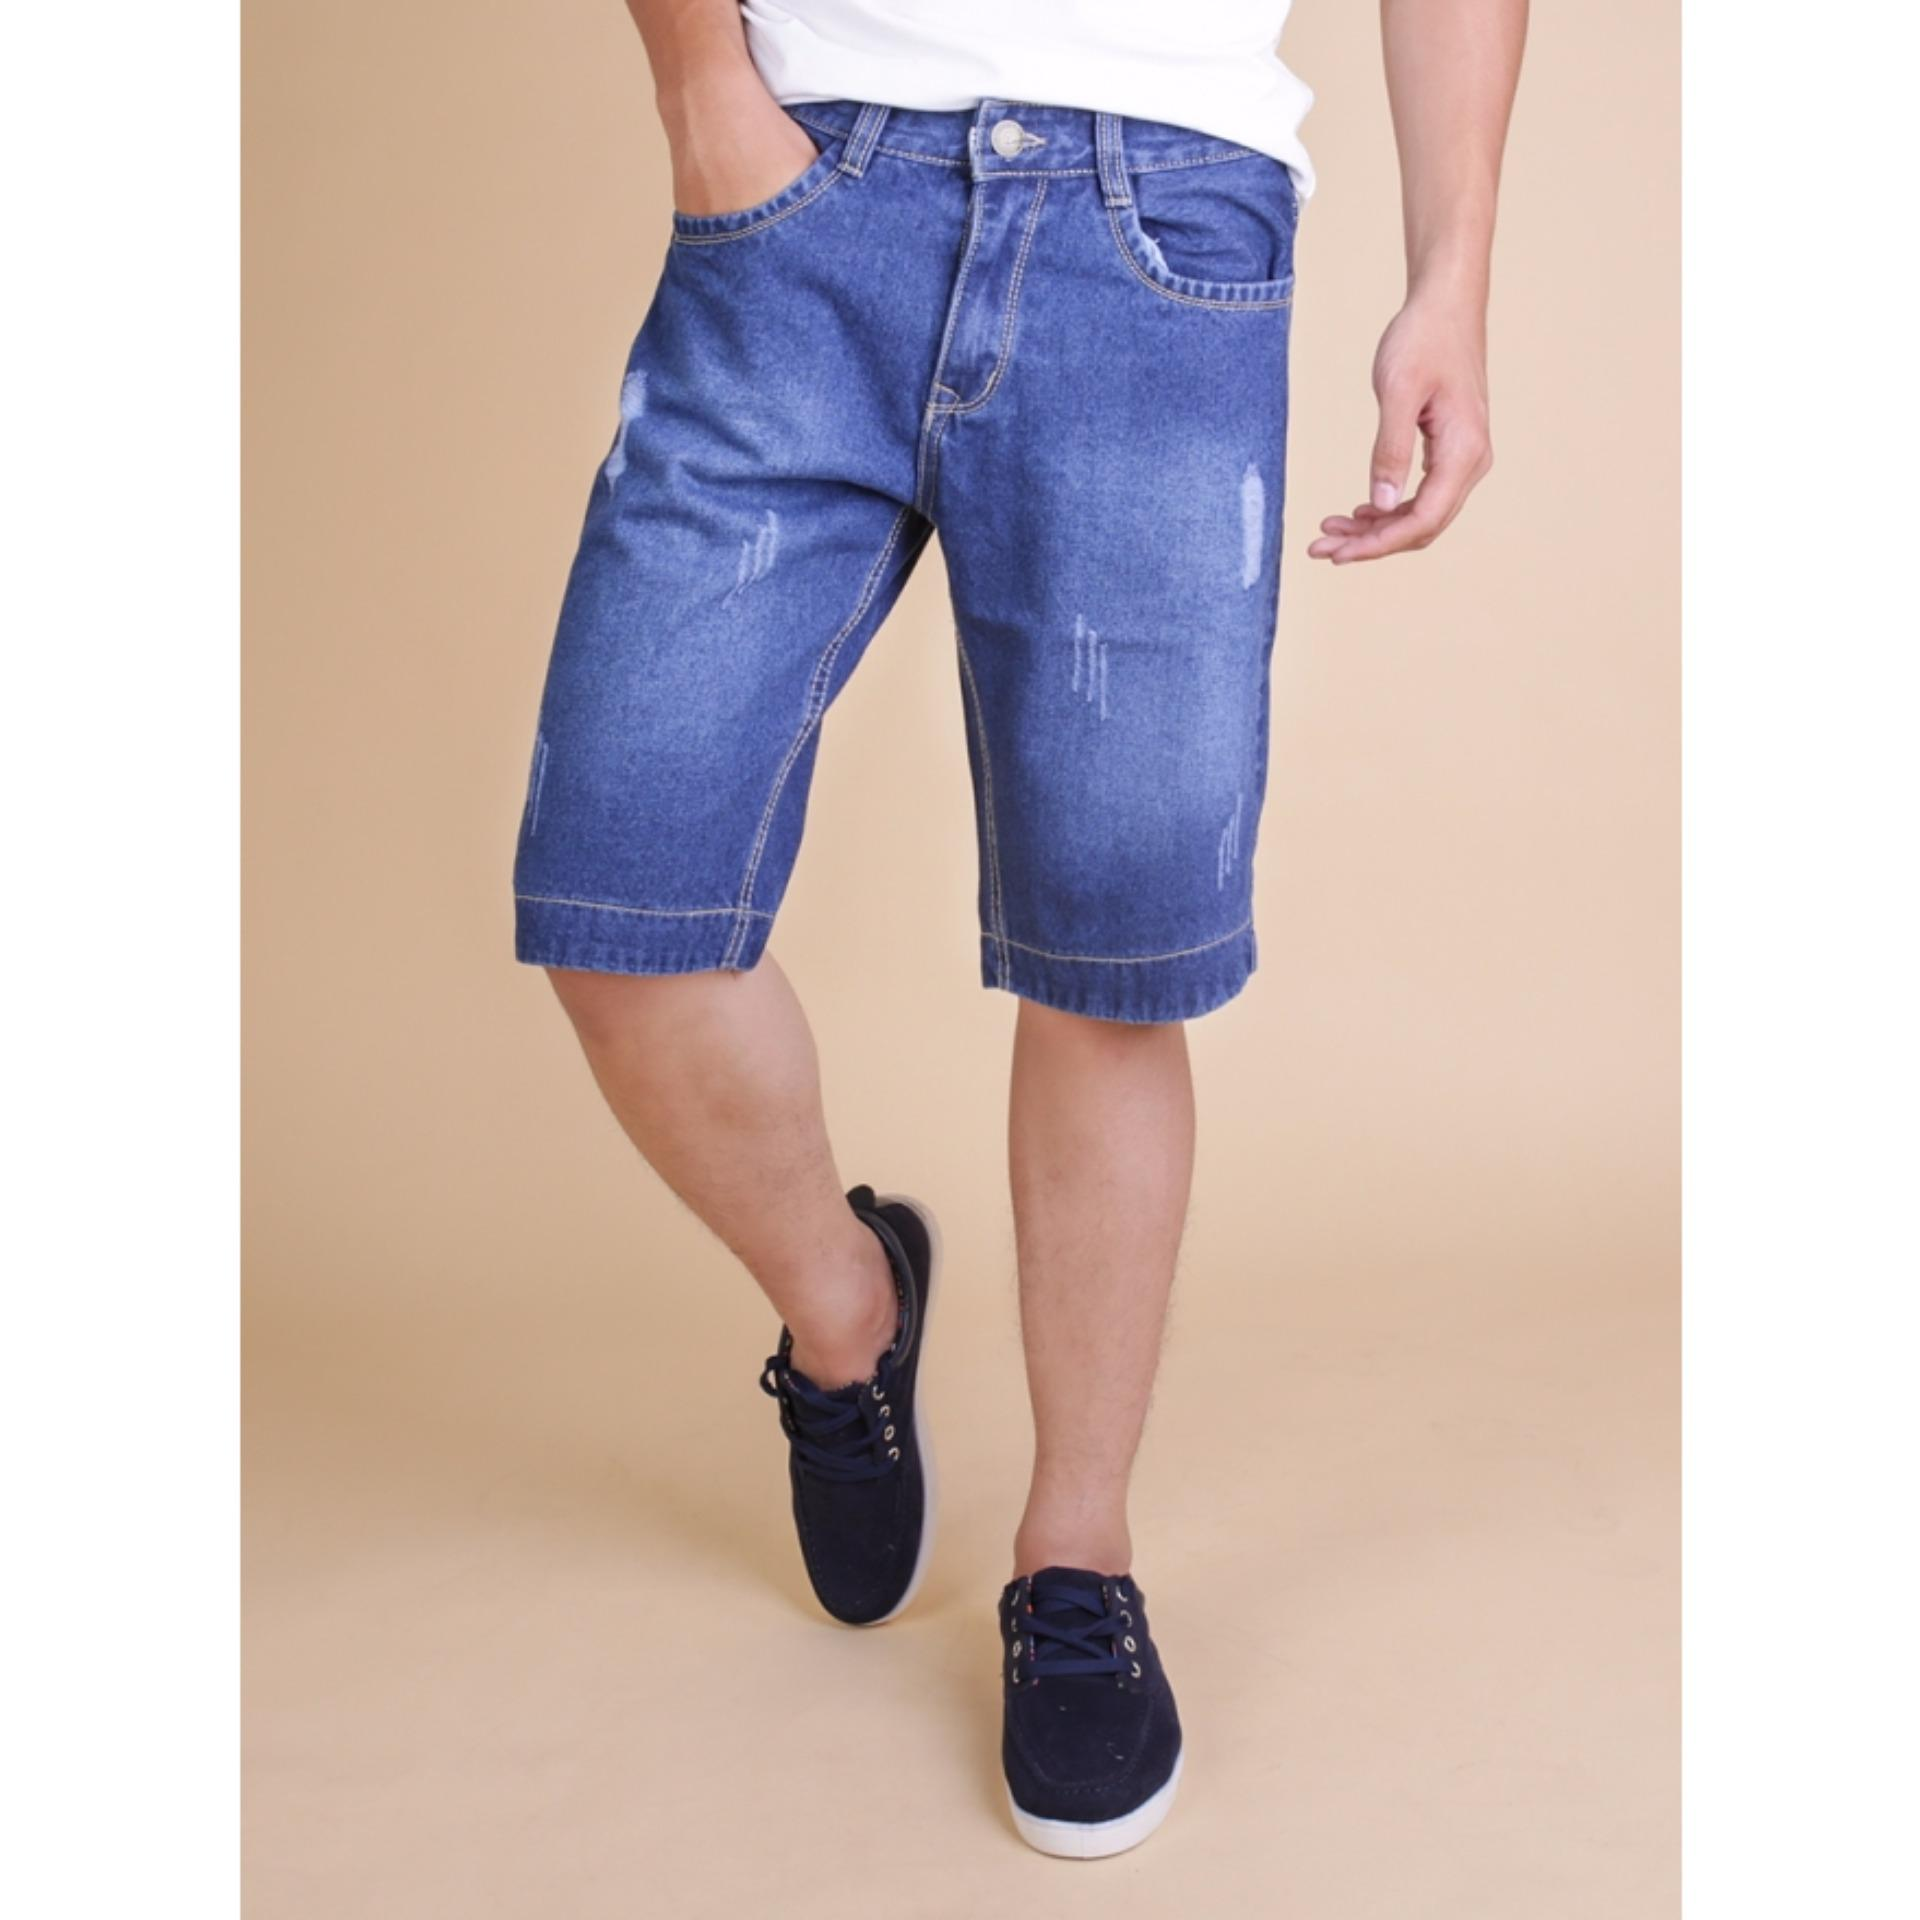 Bộ 2 Quần Short Thun Tops Cao Cấp Lb Fashion